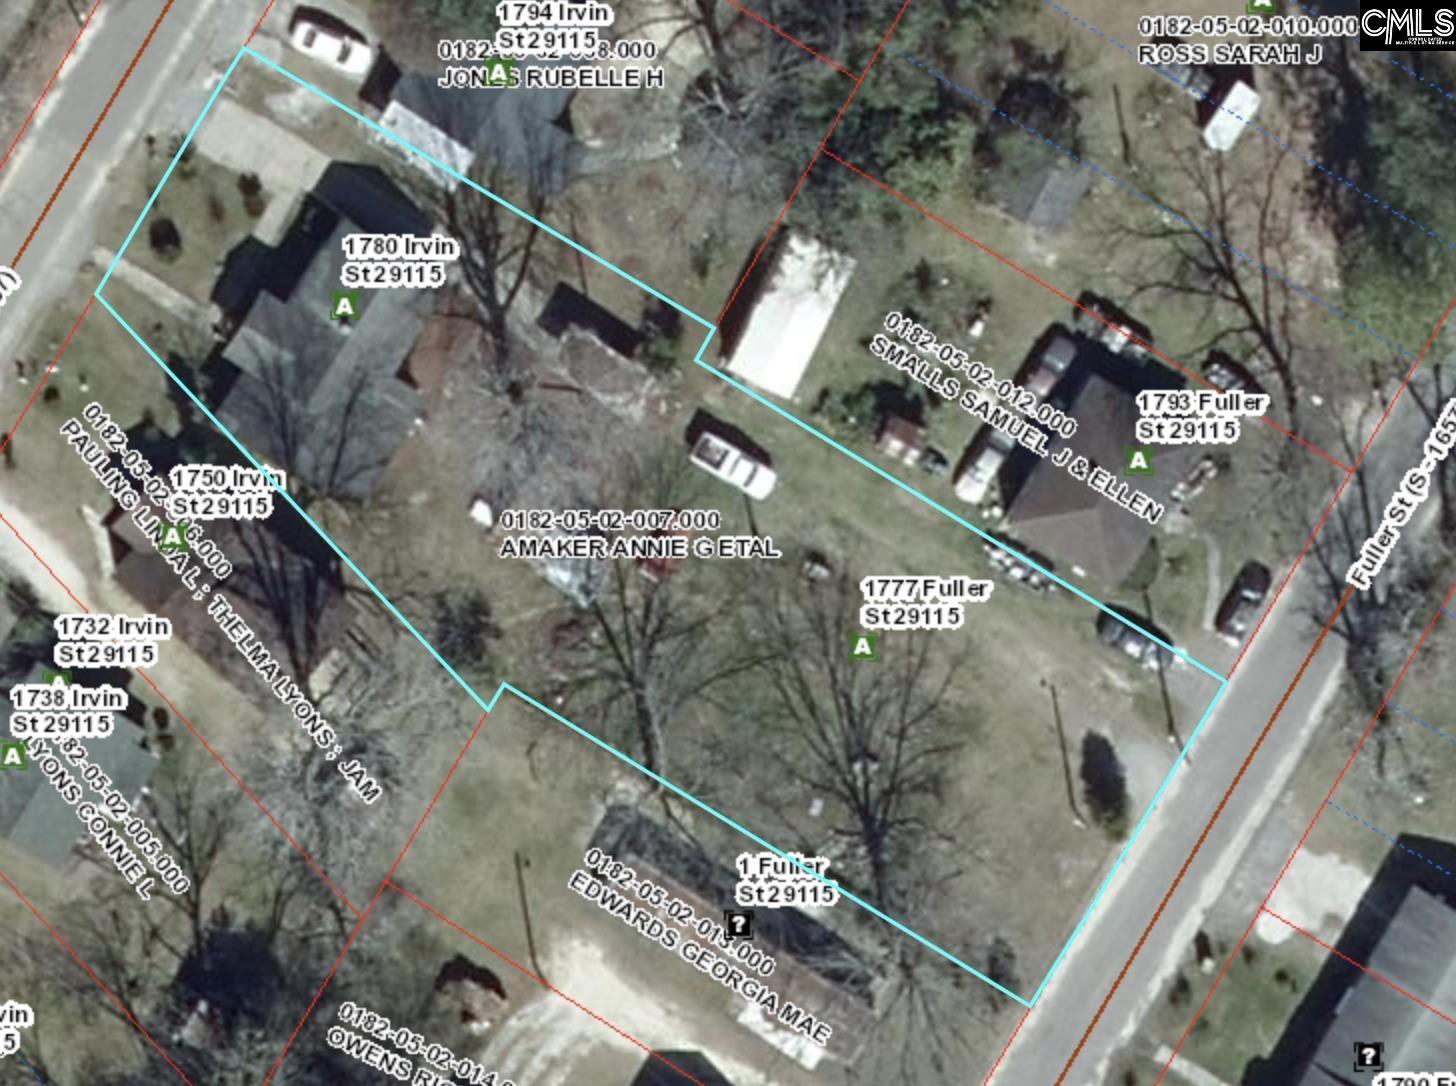 1780 Irvin Street Orangeburg, SC 29115